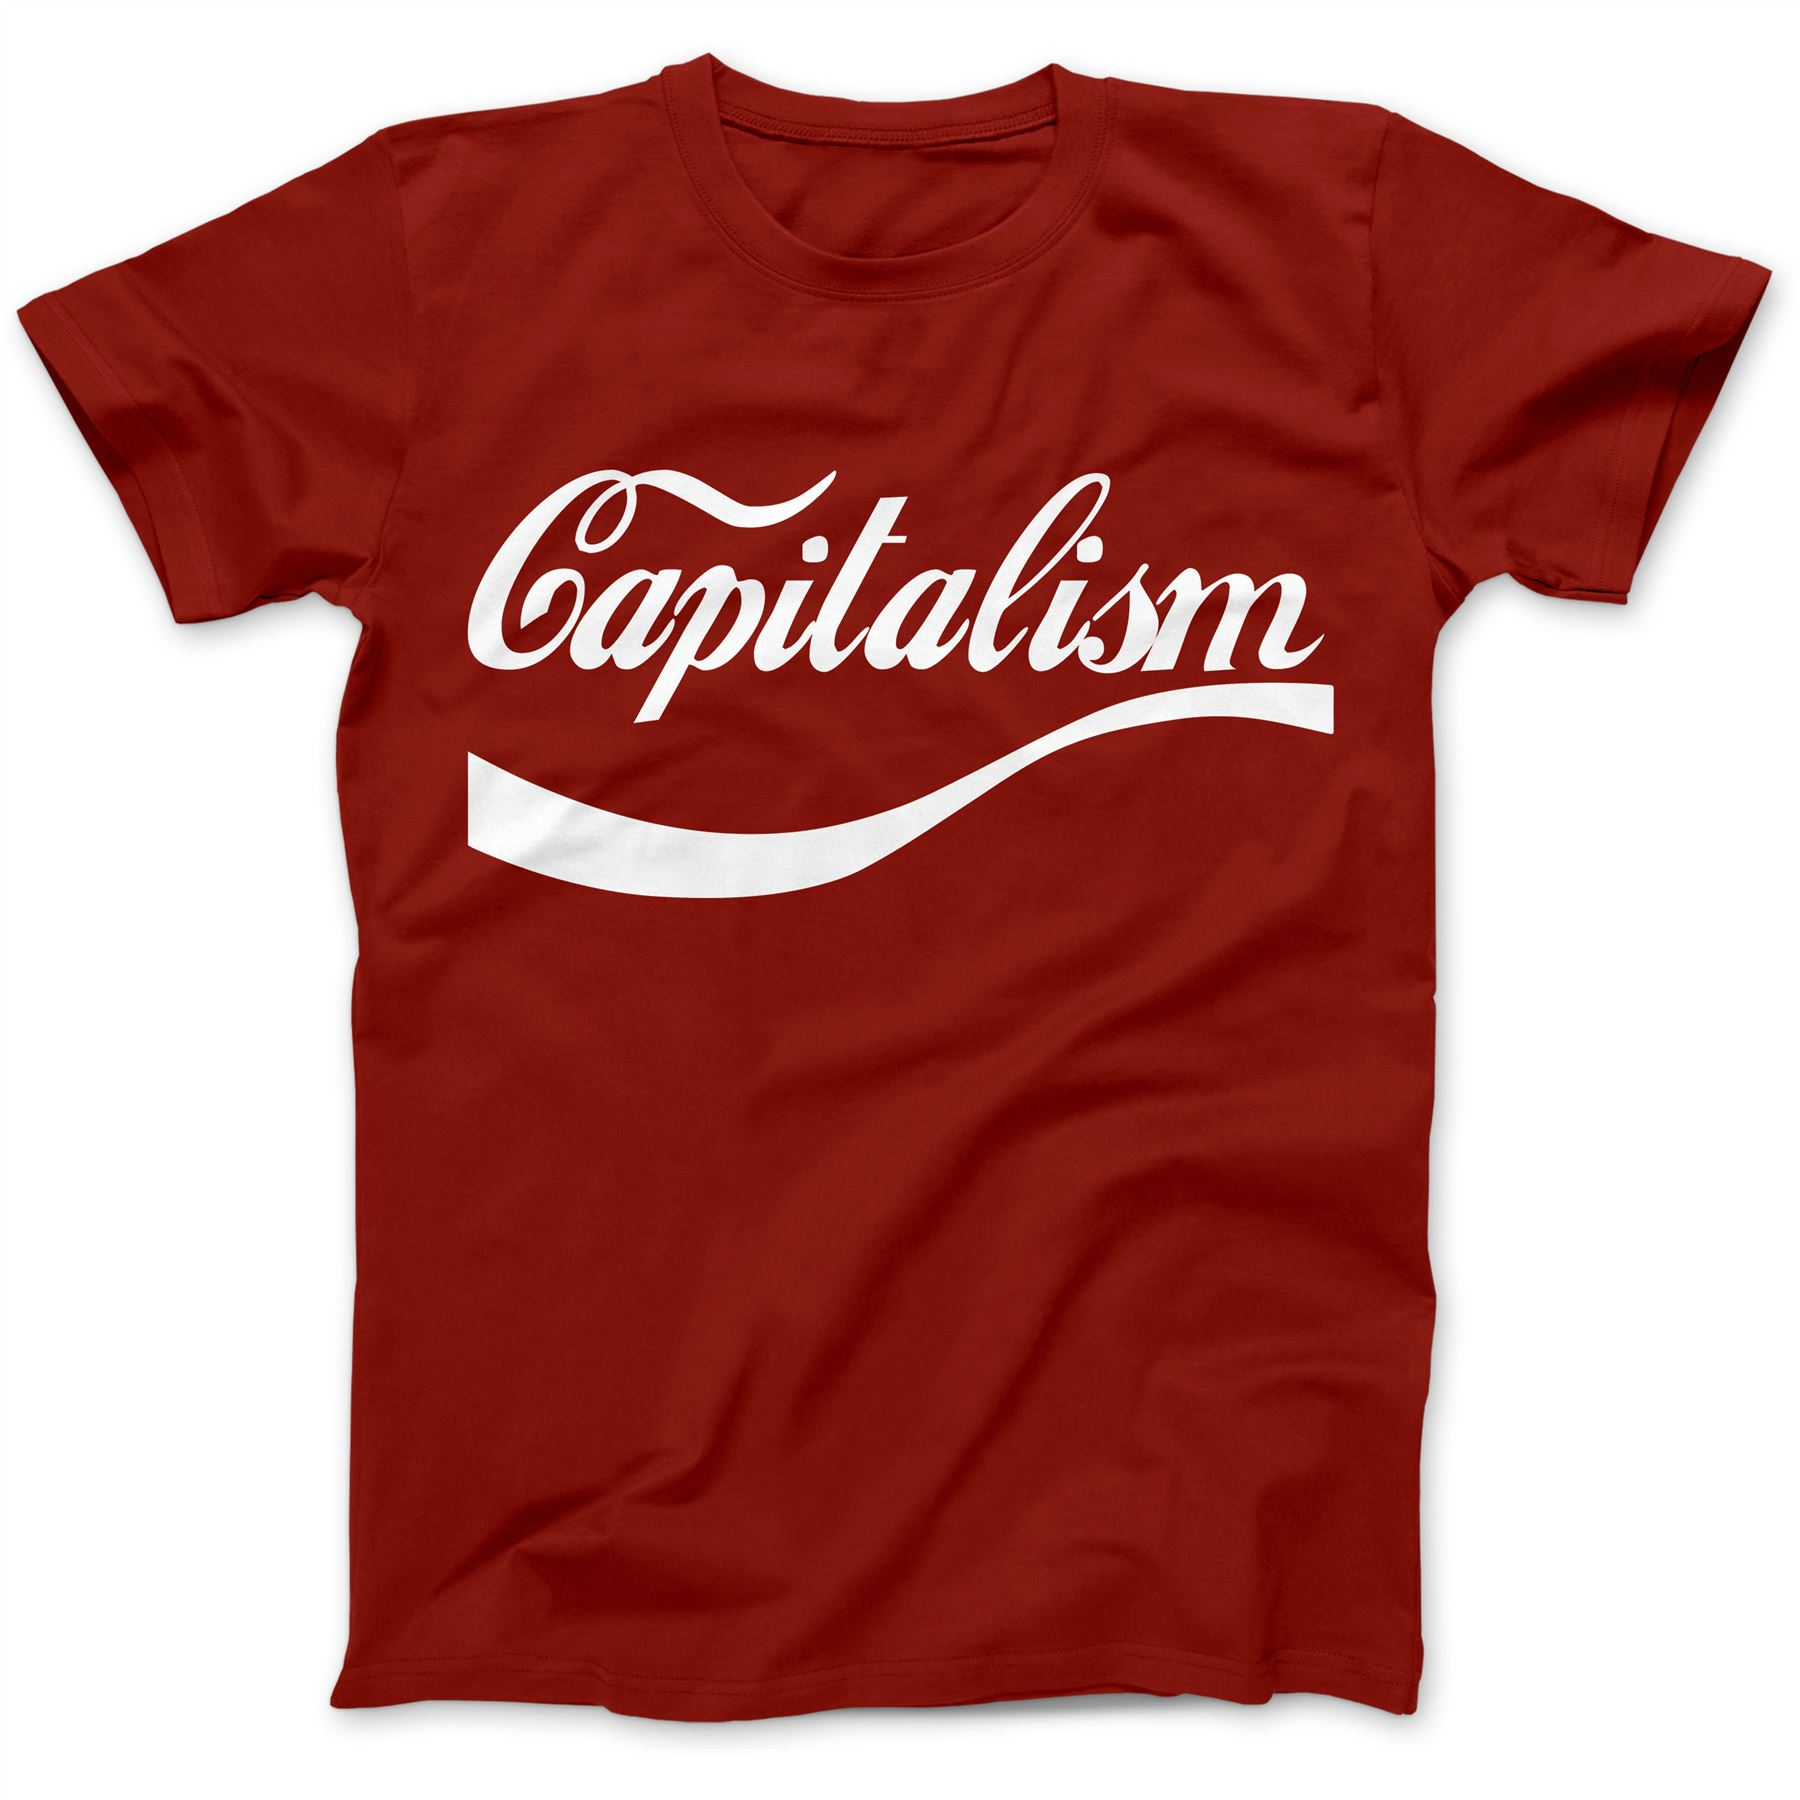 Enjoy Capitalism T-Shirt 100/% Premium Cotton Karl Marx Socialism Communism